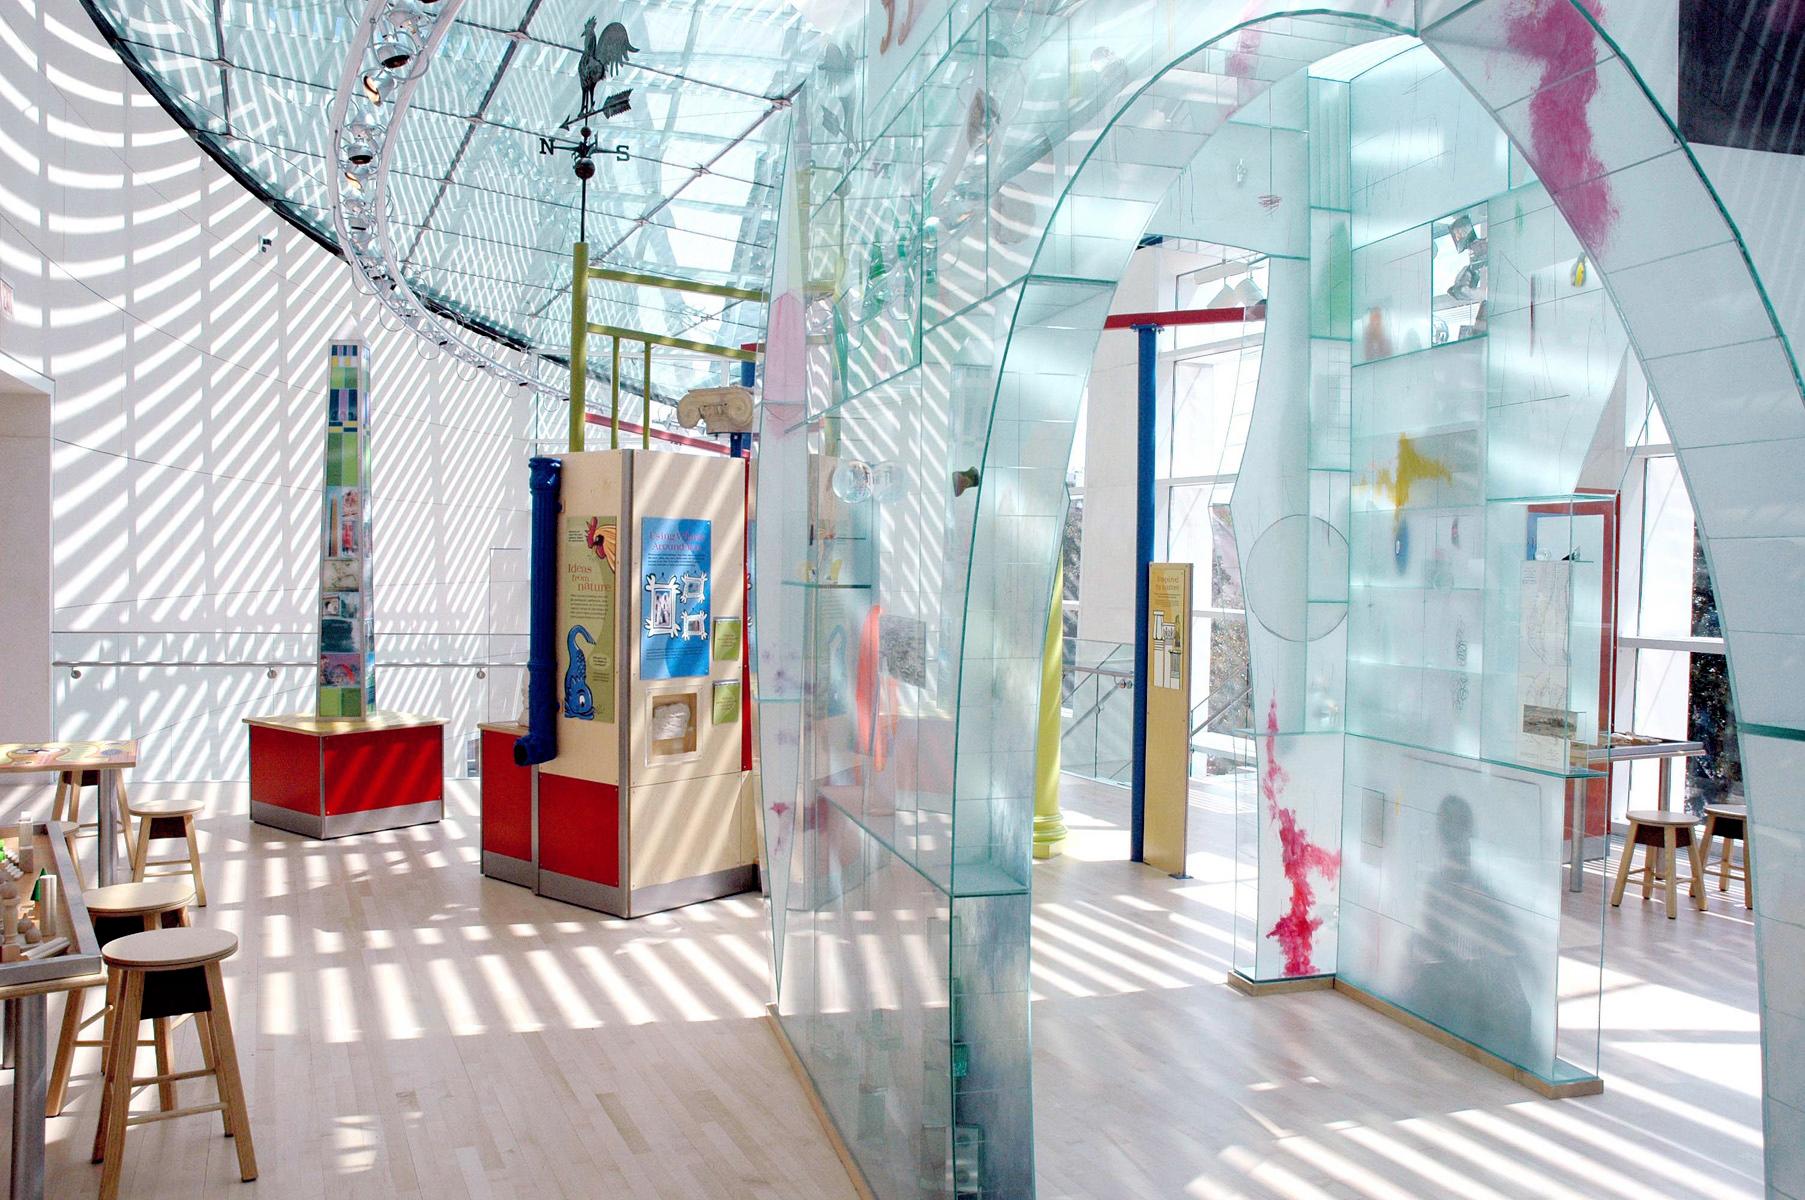 ArtZeum is a fun, family-friendly activity inside the Jepson Center.